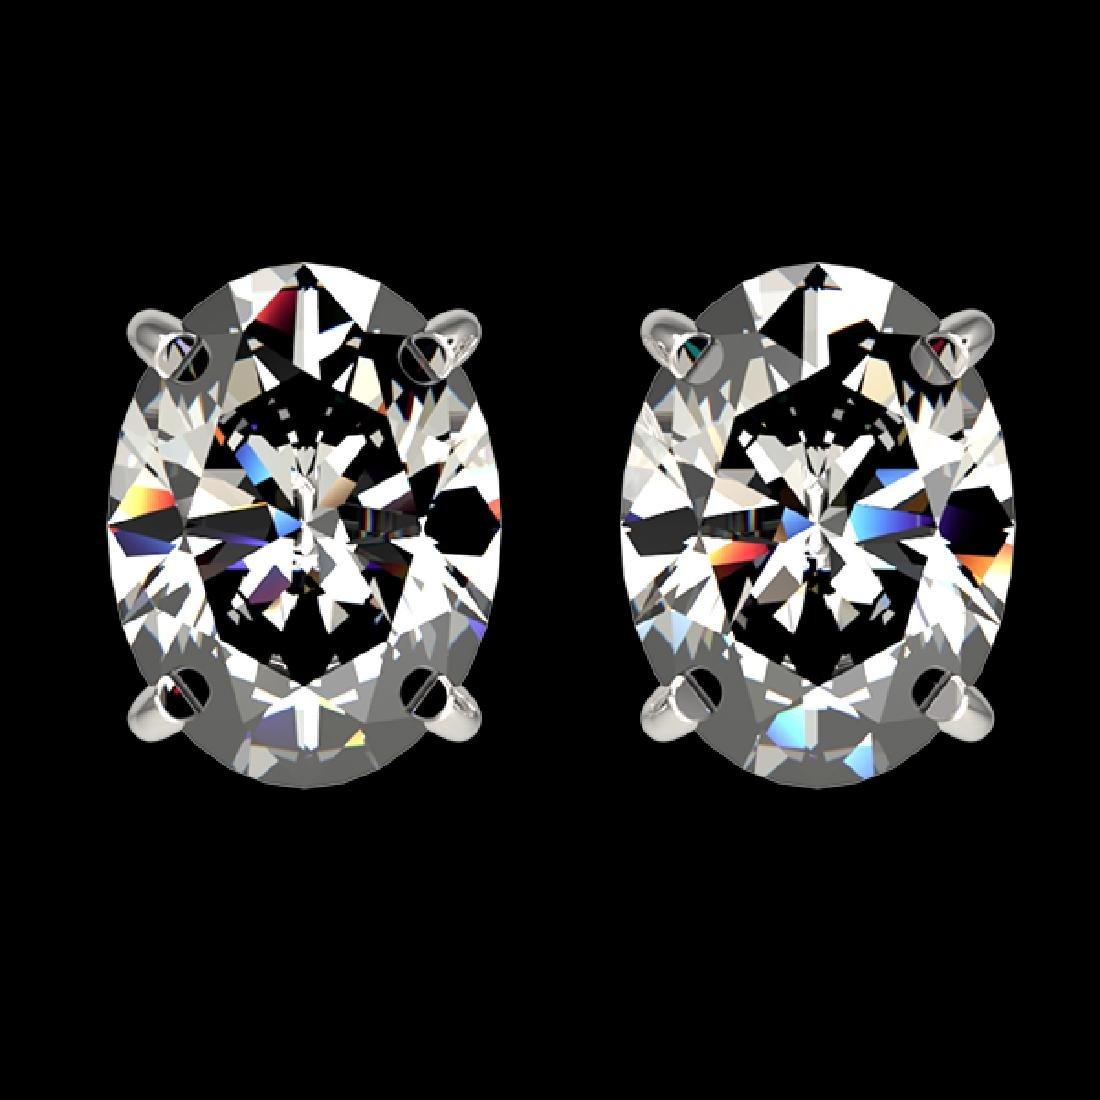 2.50 CTW Certified VS/SI Quality Oval Diamond Stud